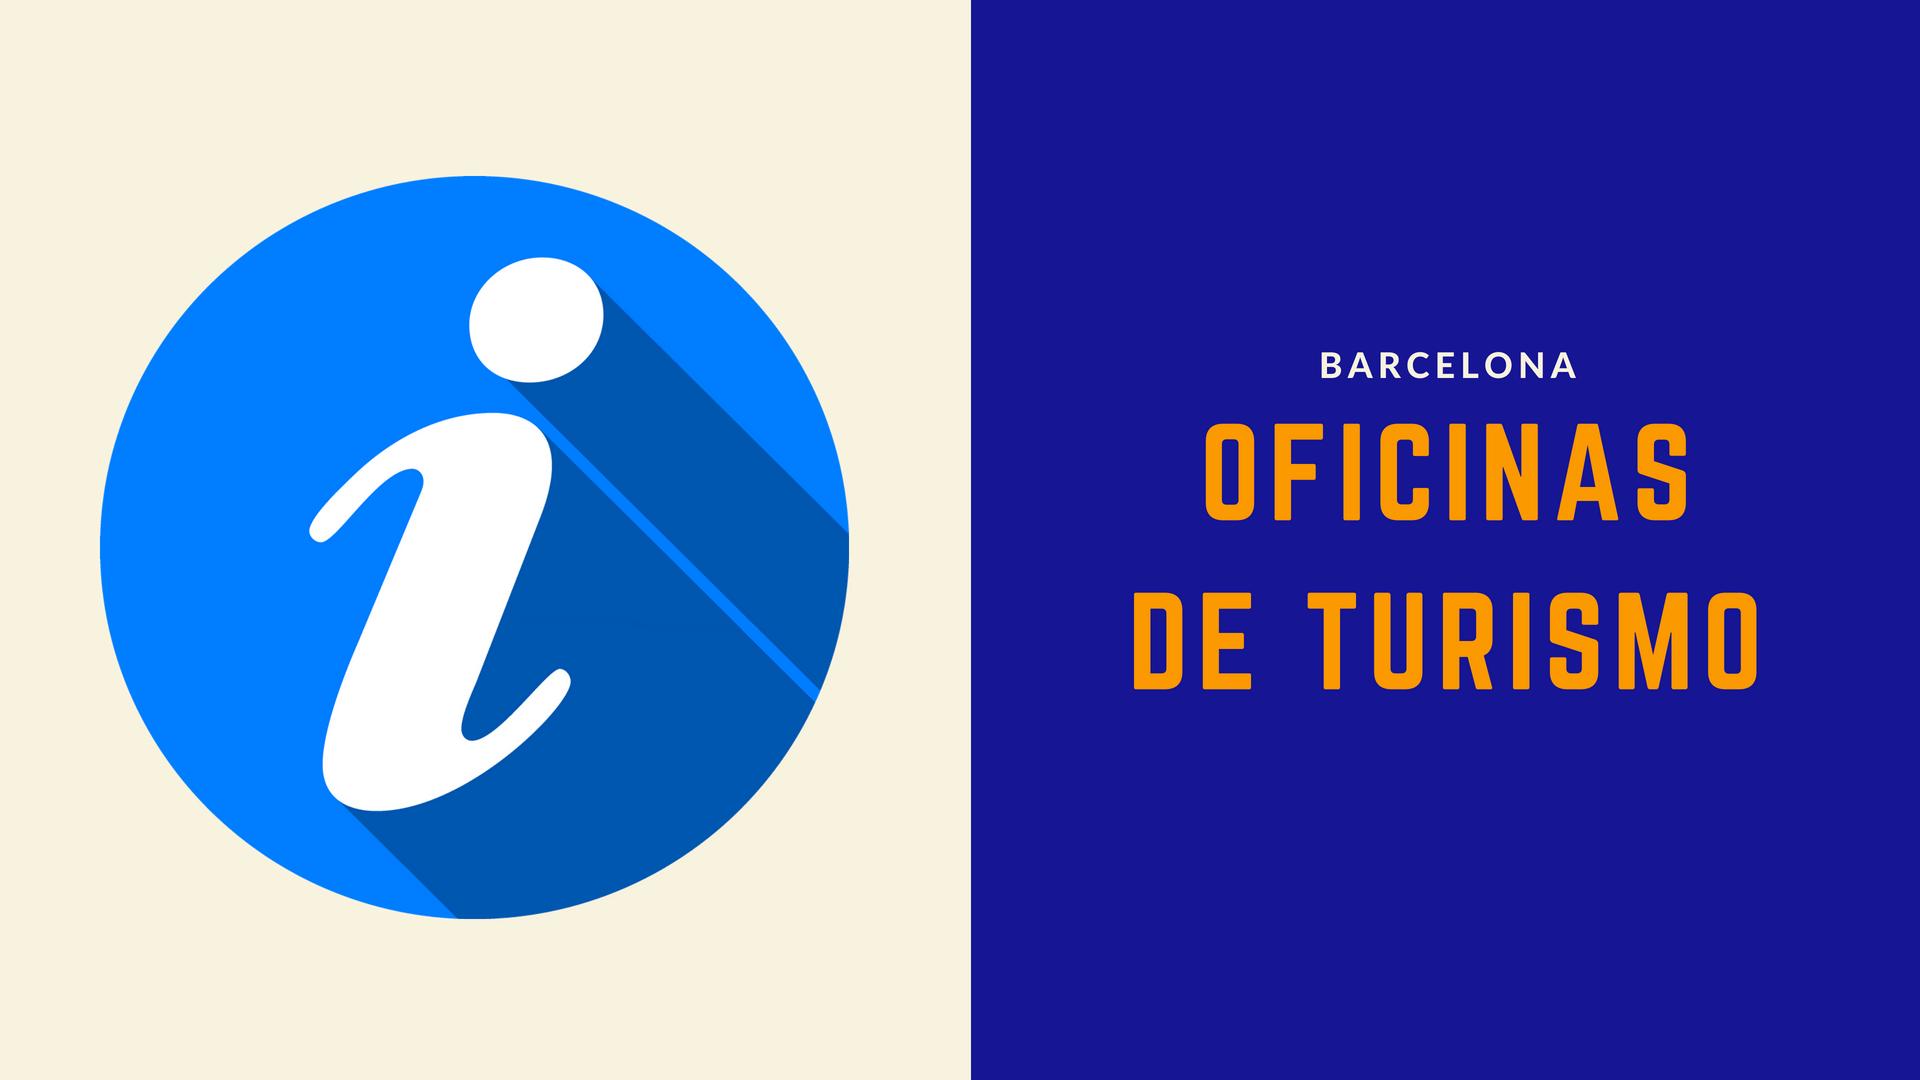 Oficinas de turismo en barcelona for Oficina de turismo barcelona